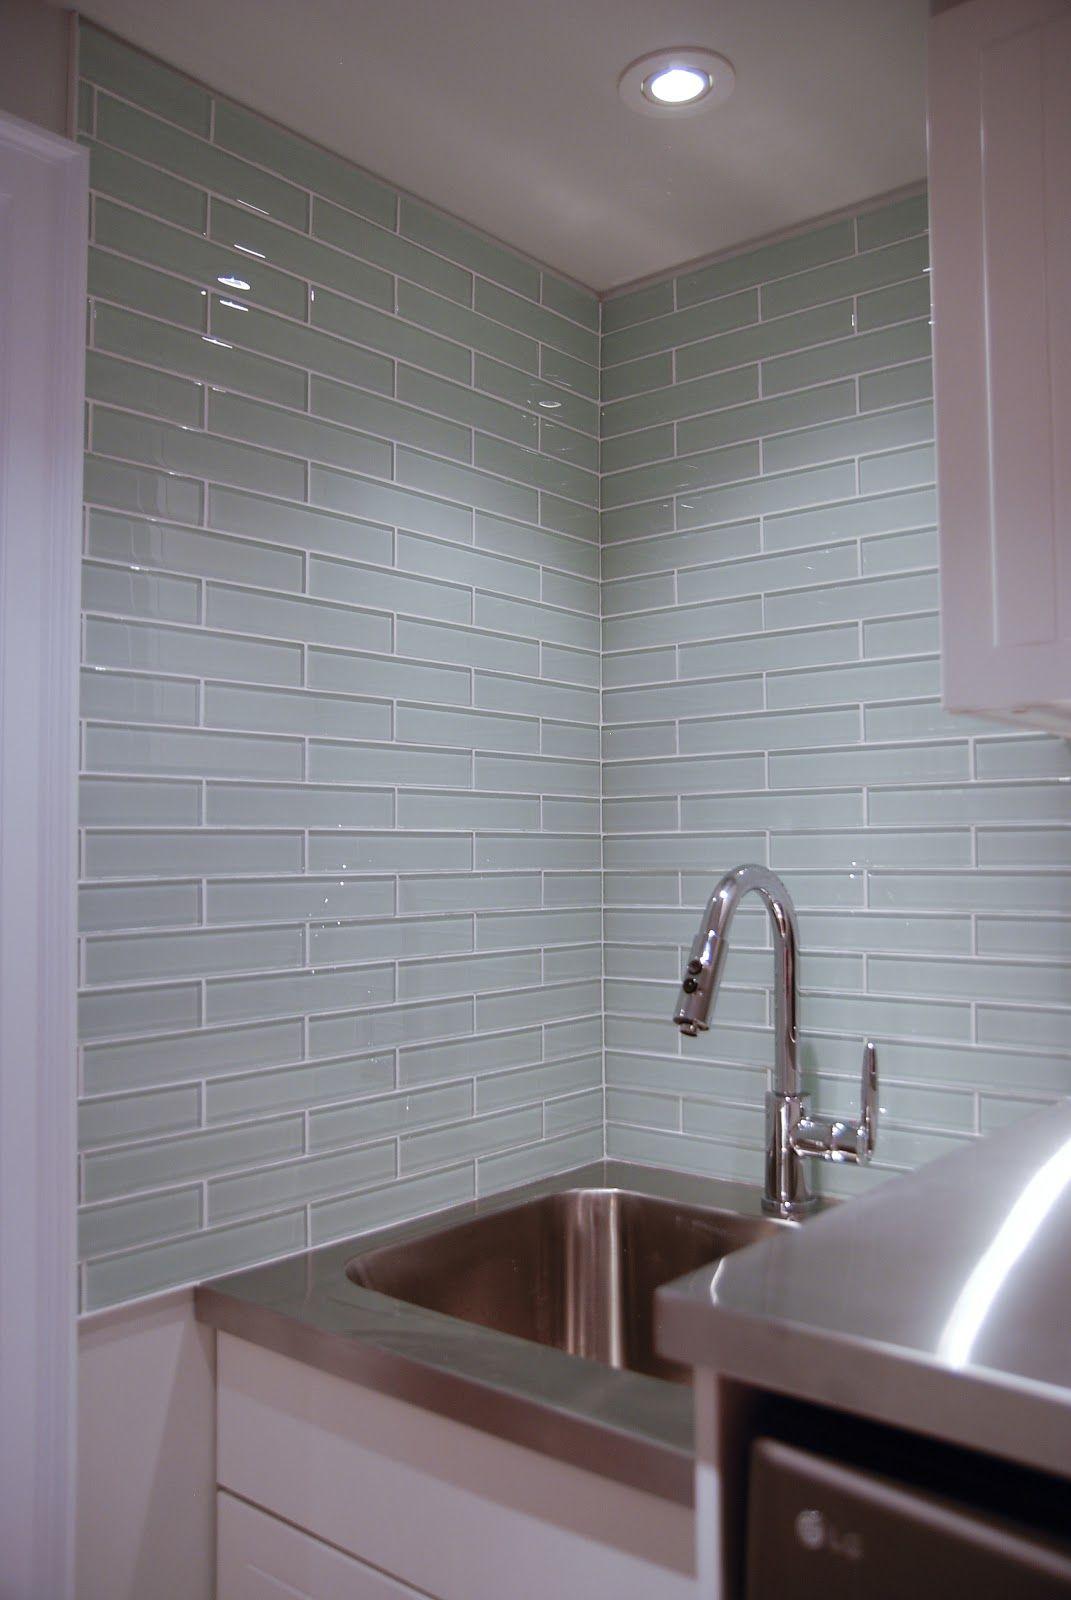 Glass Tiles Kitchen Backsplash: Kitchen Backsplash Http://centura.ca/residential/glass